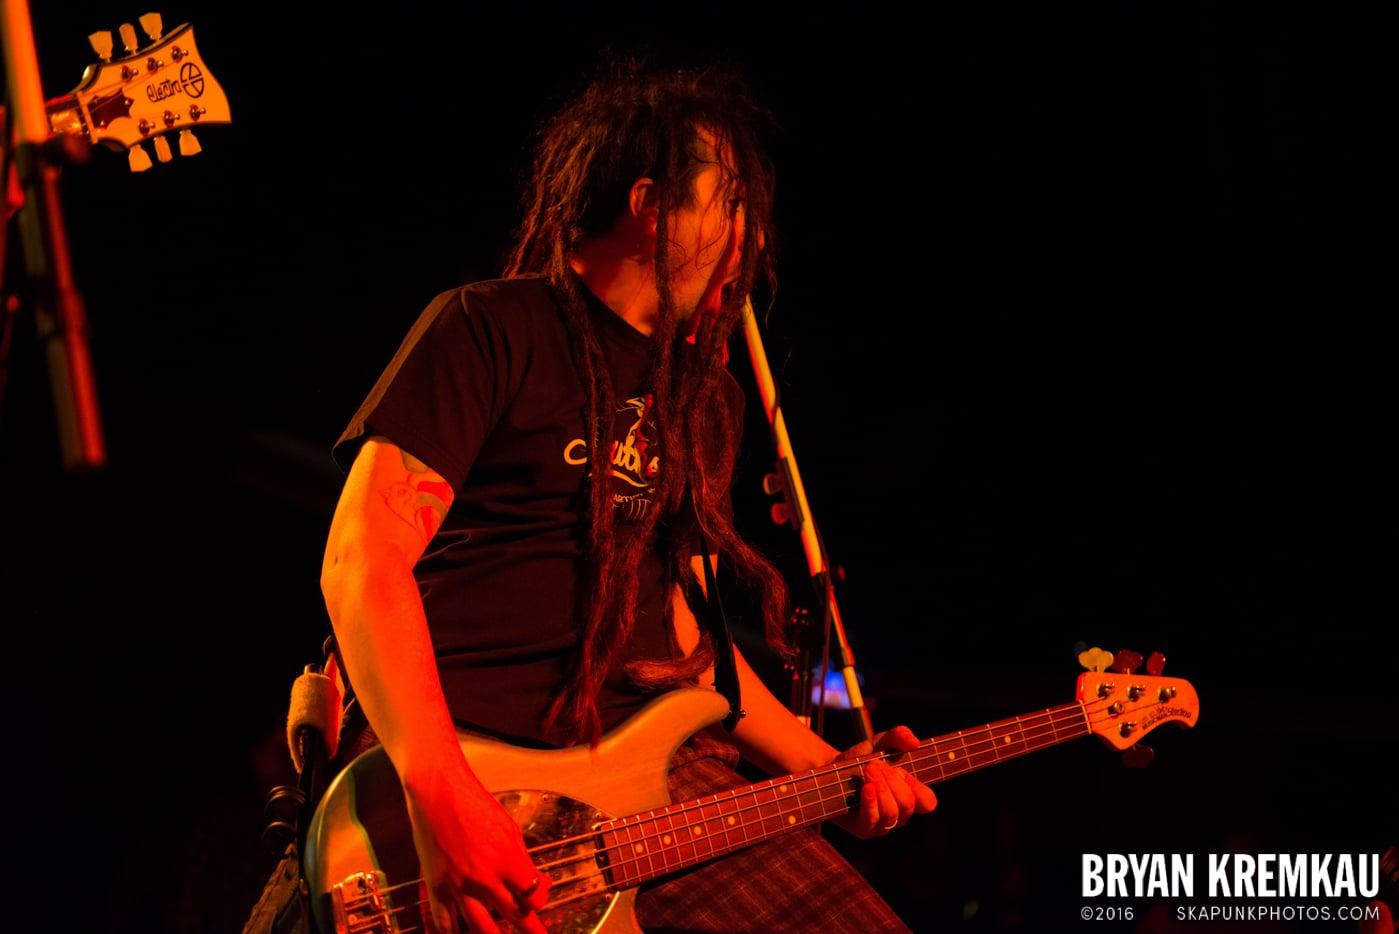 Less Than Jake @ Starland Ballroom, Sayreville, NJ - 11.9.13 (6)